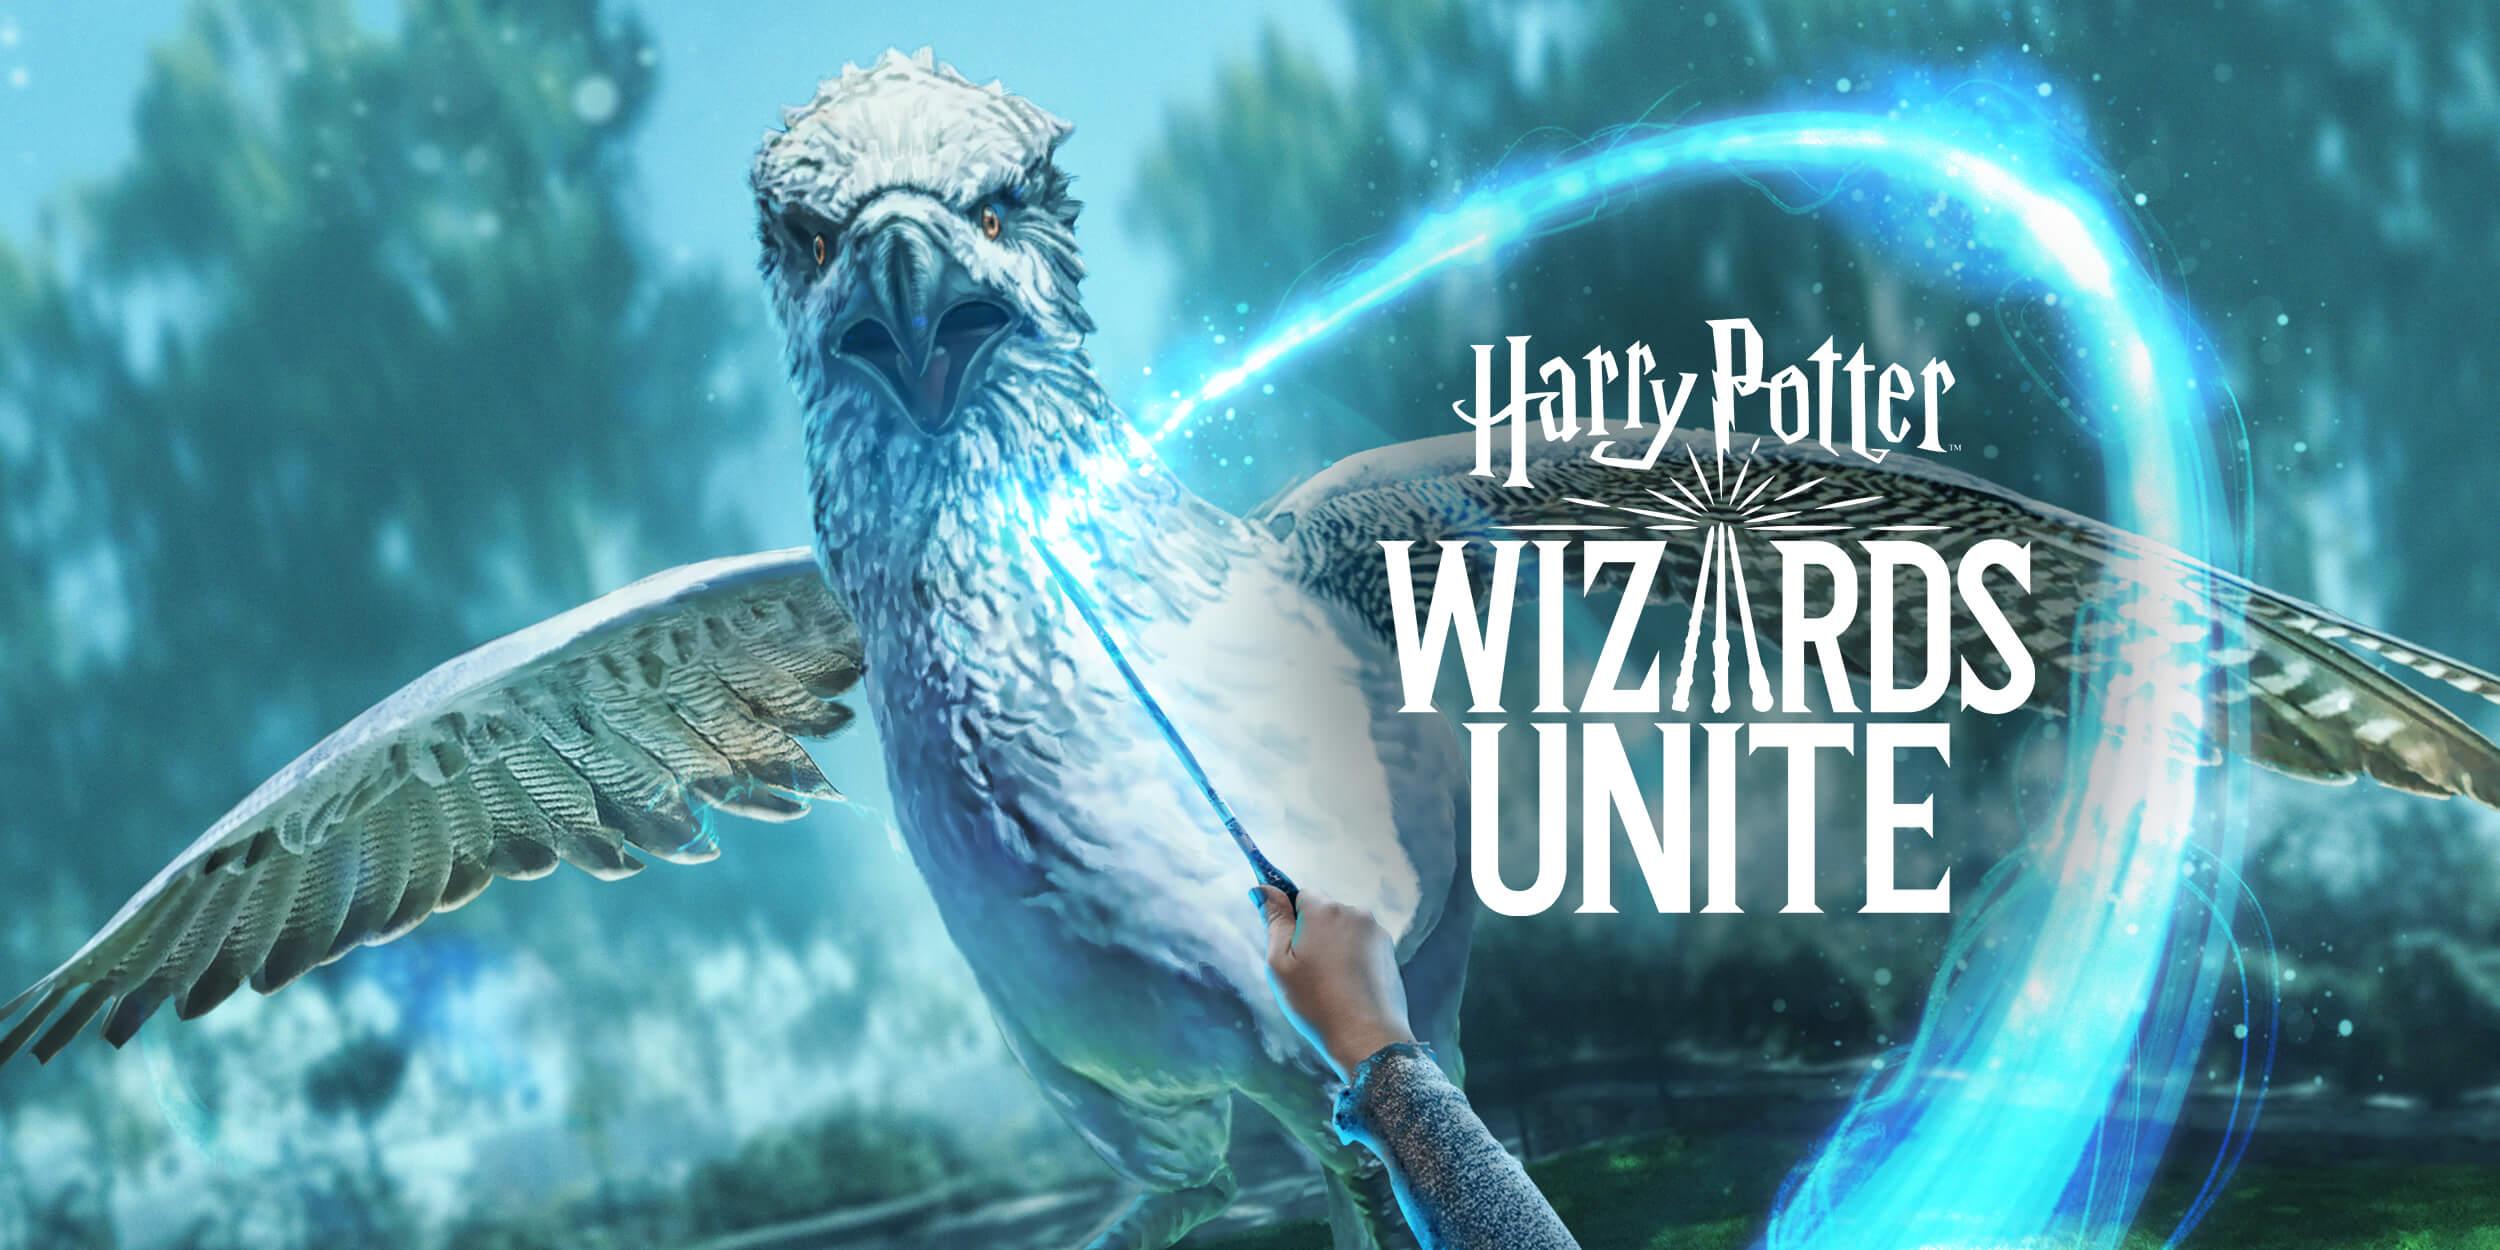 3 cosas que debés saber antes de jugar Harry Potter: Wizards Unite